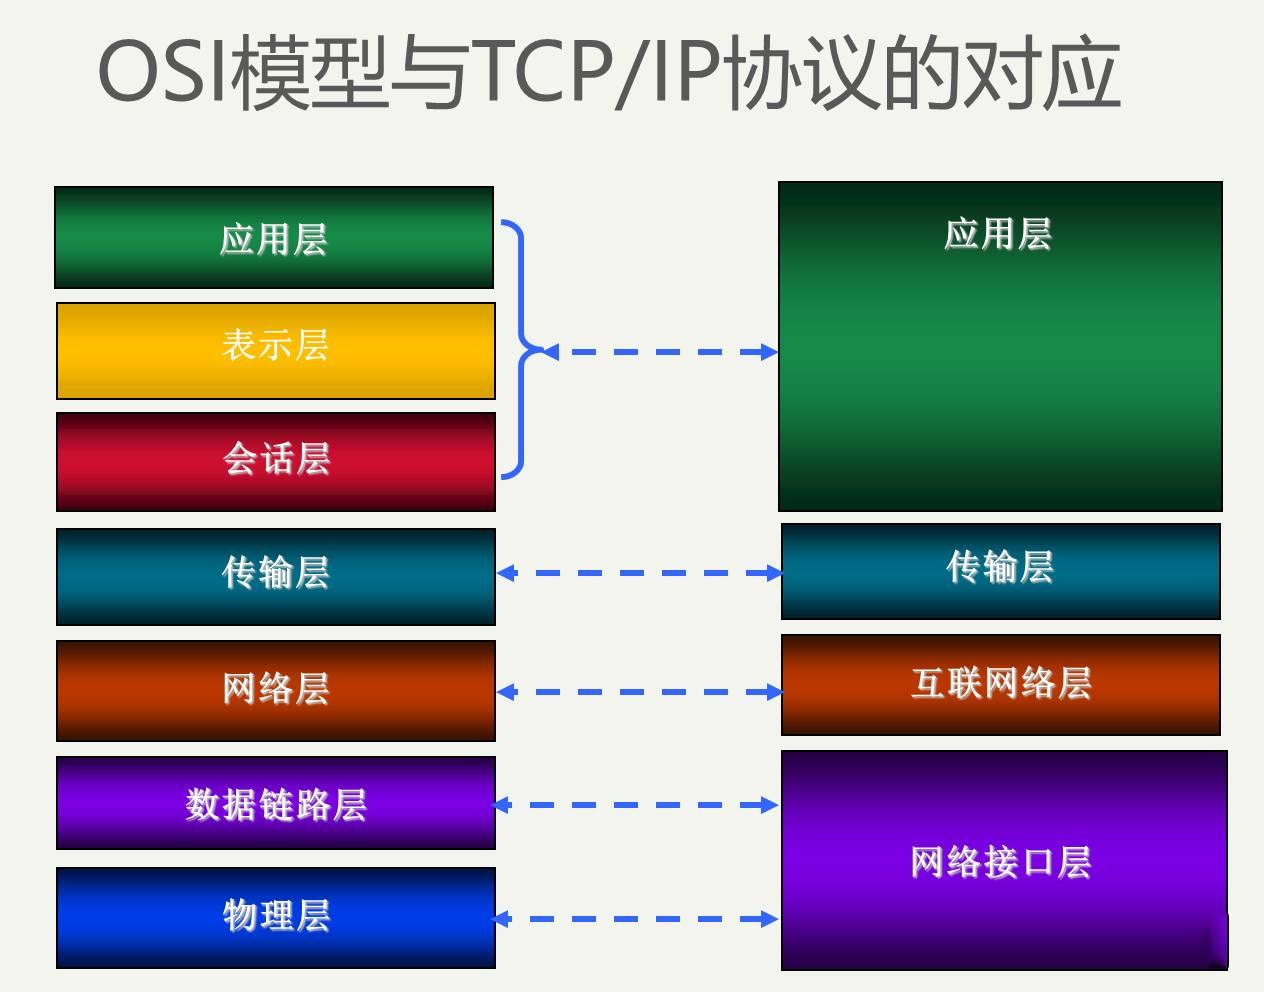 OSI模型与TCP/IP协议的对应